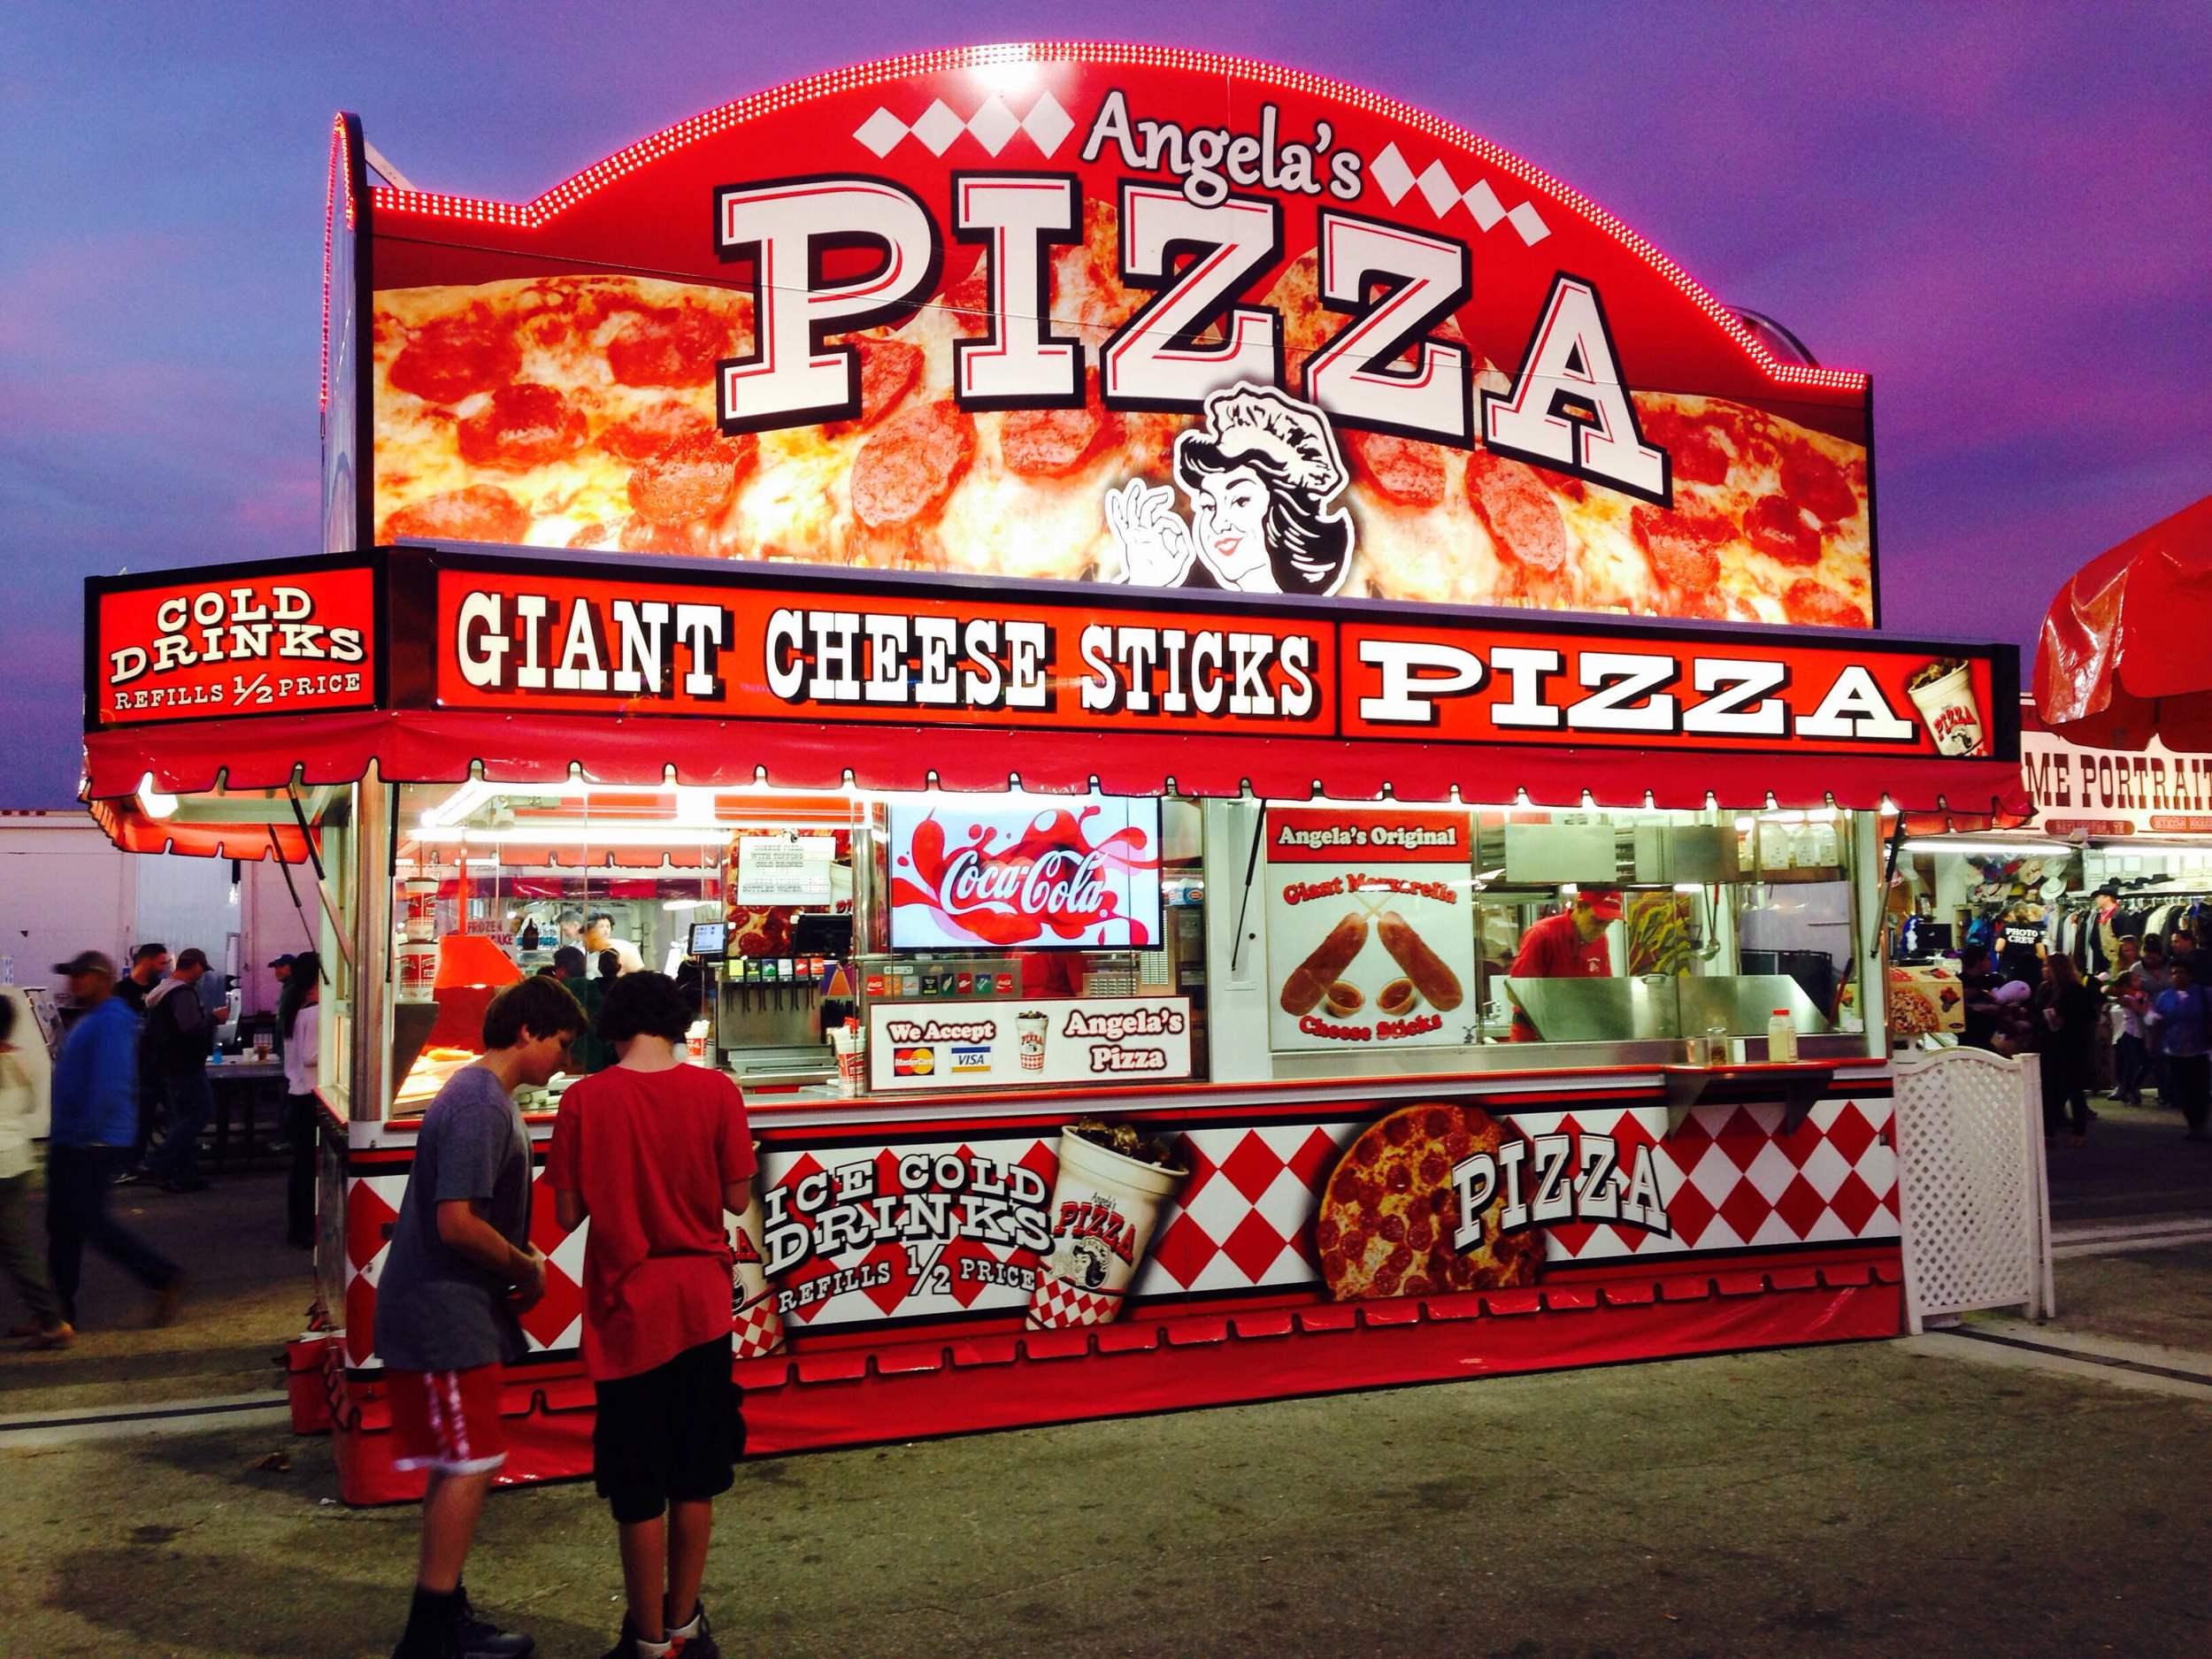 Angela's Pizza - South Florida Fair 2015 - West Palm Beach, FL